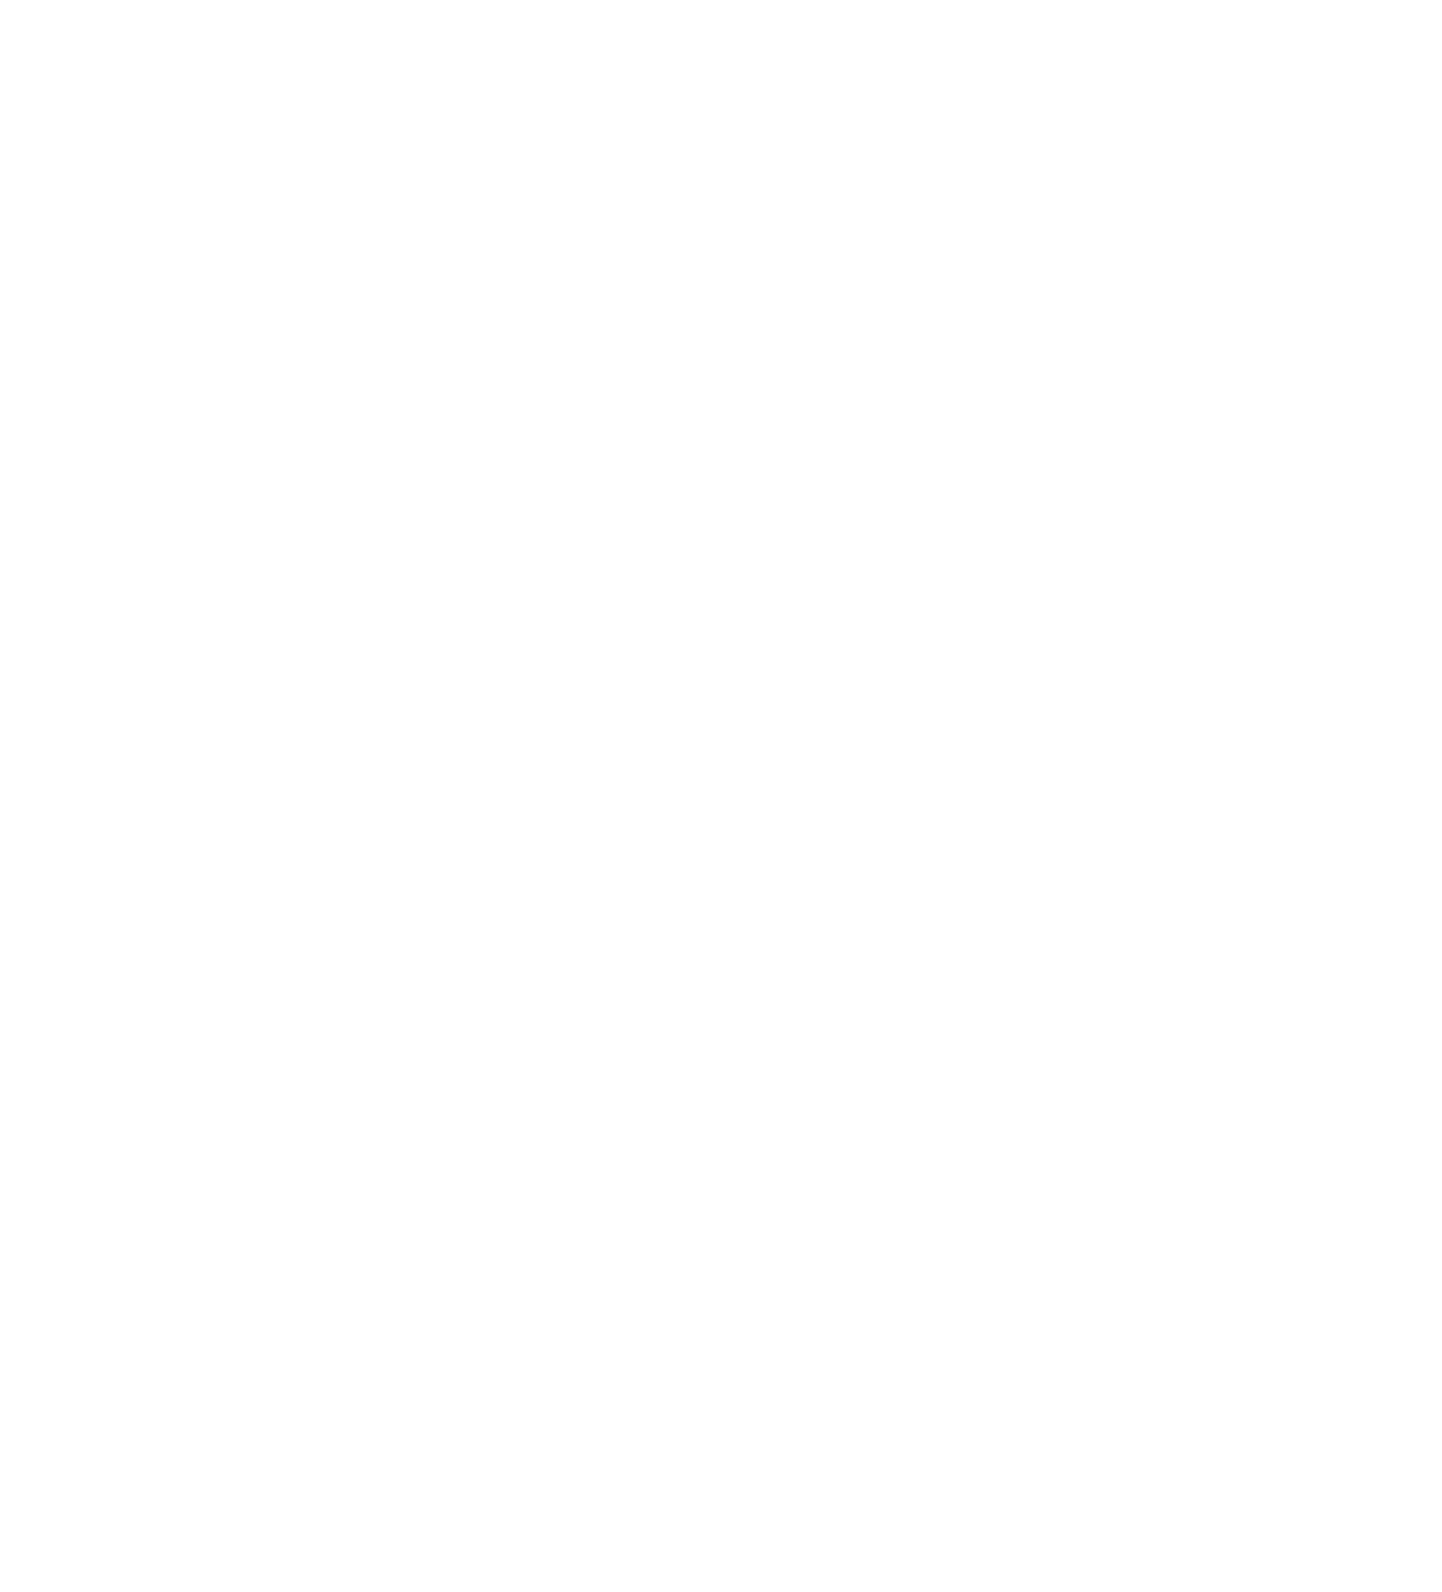 instructor-image